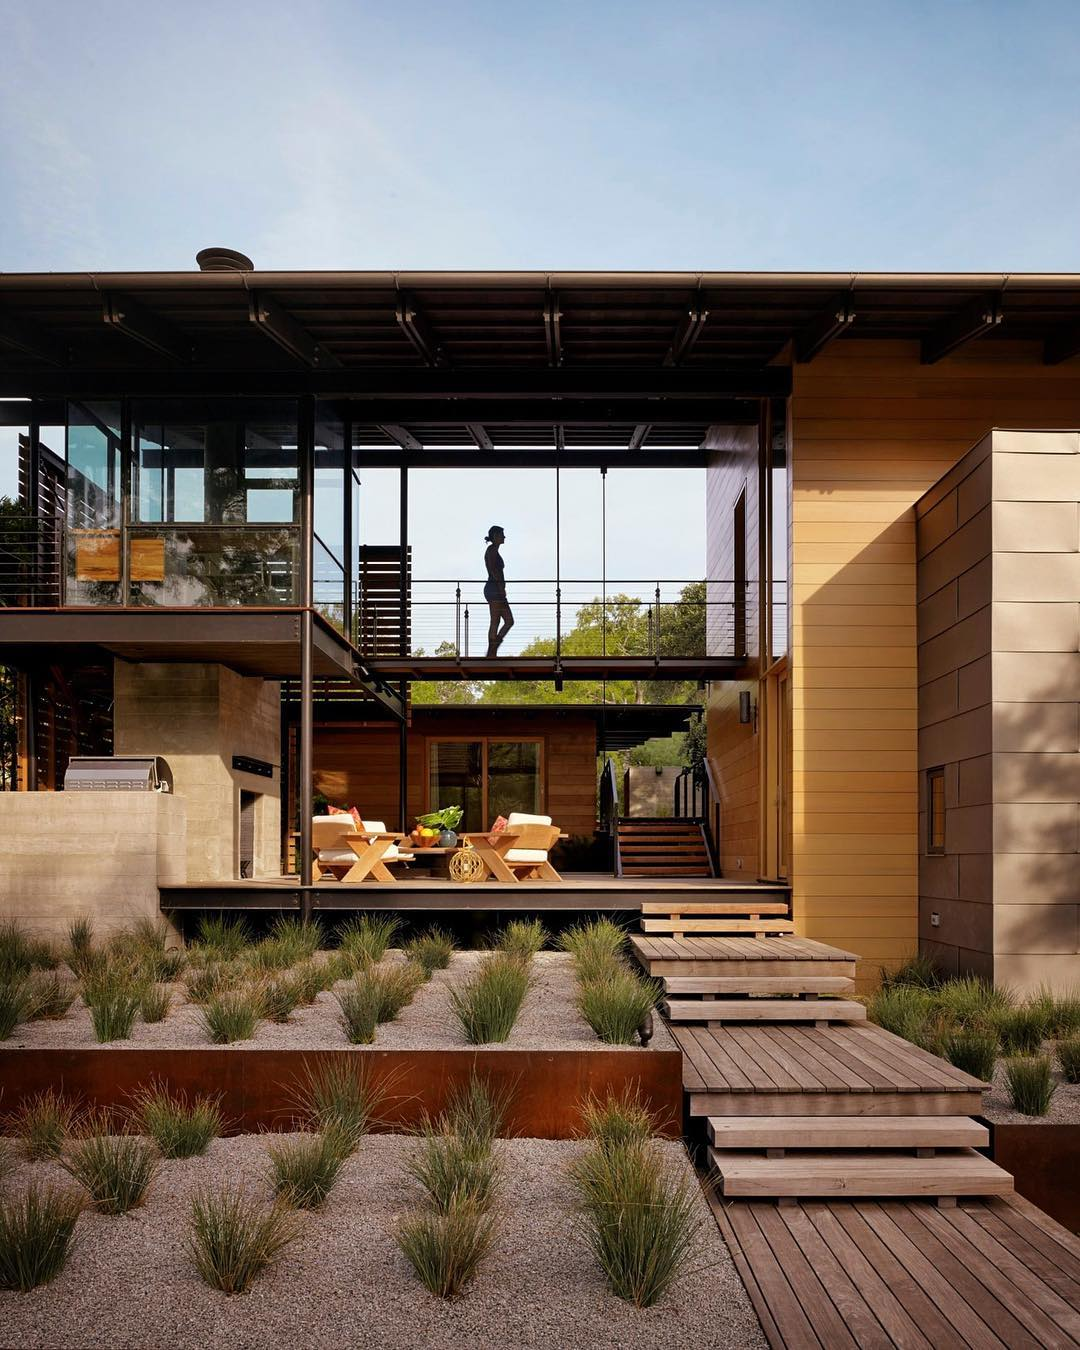 Architecture - Hog Pen Creek Residence, Lake Flato Architects, Texas, Brown, Green.jpg